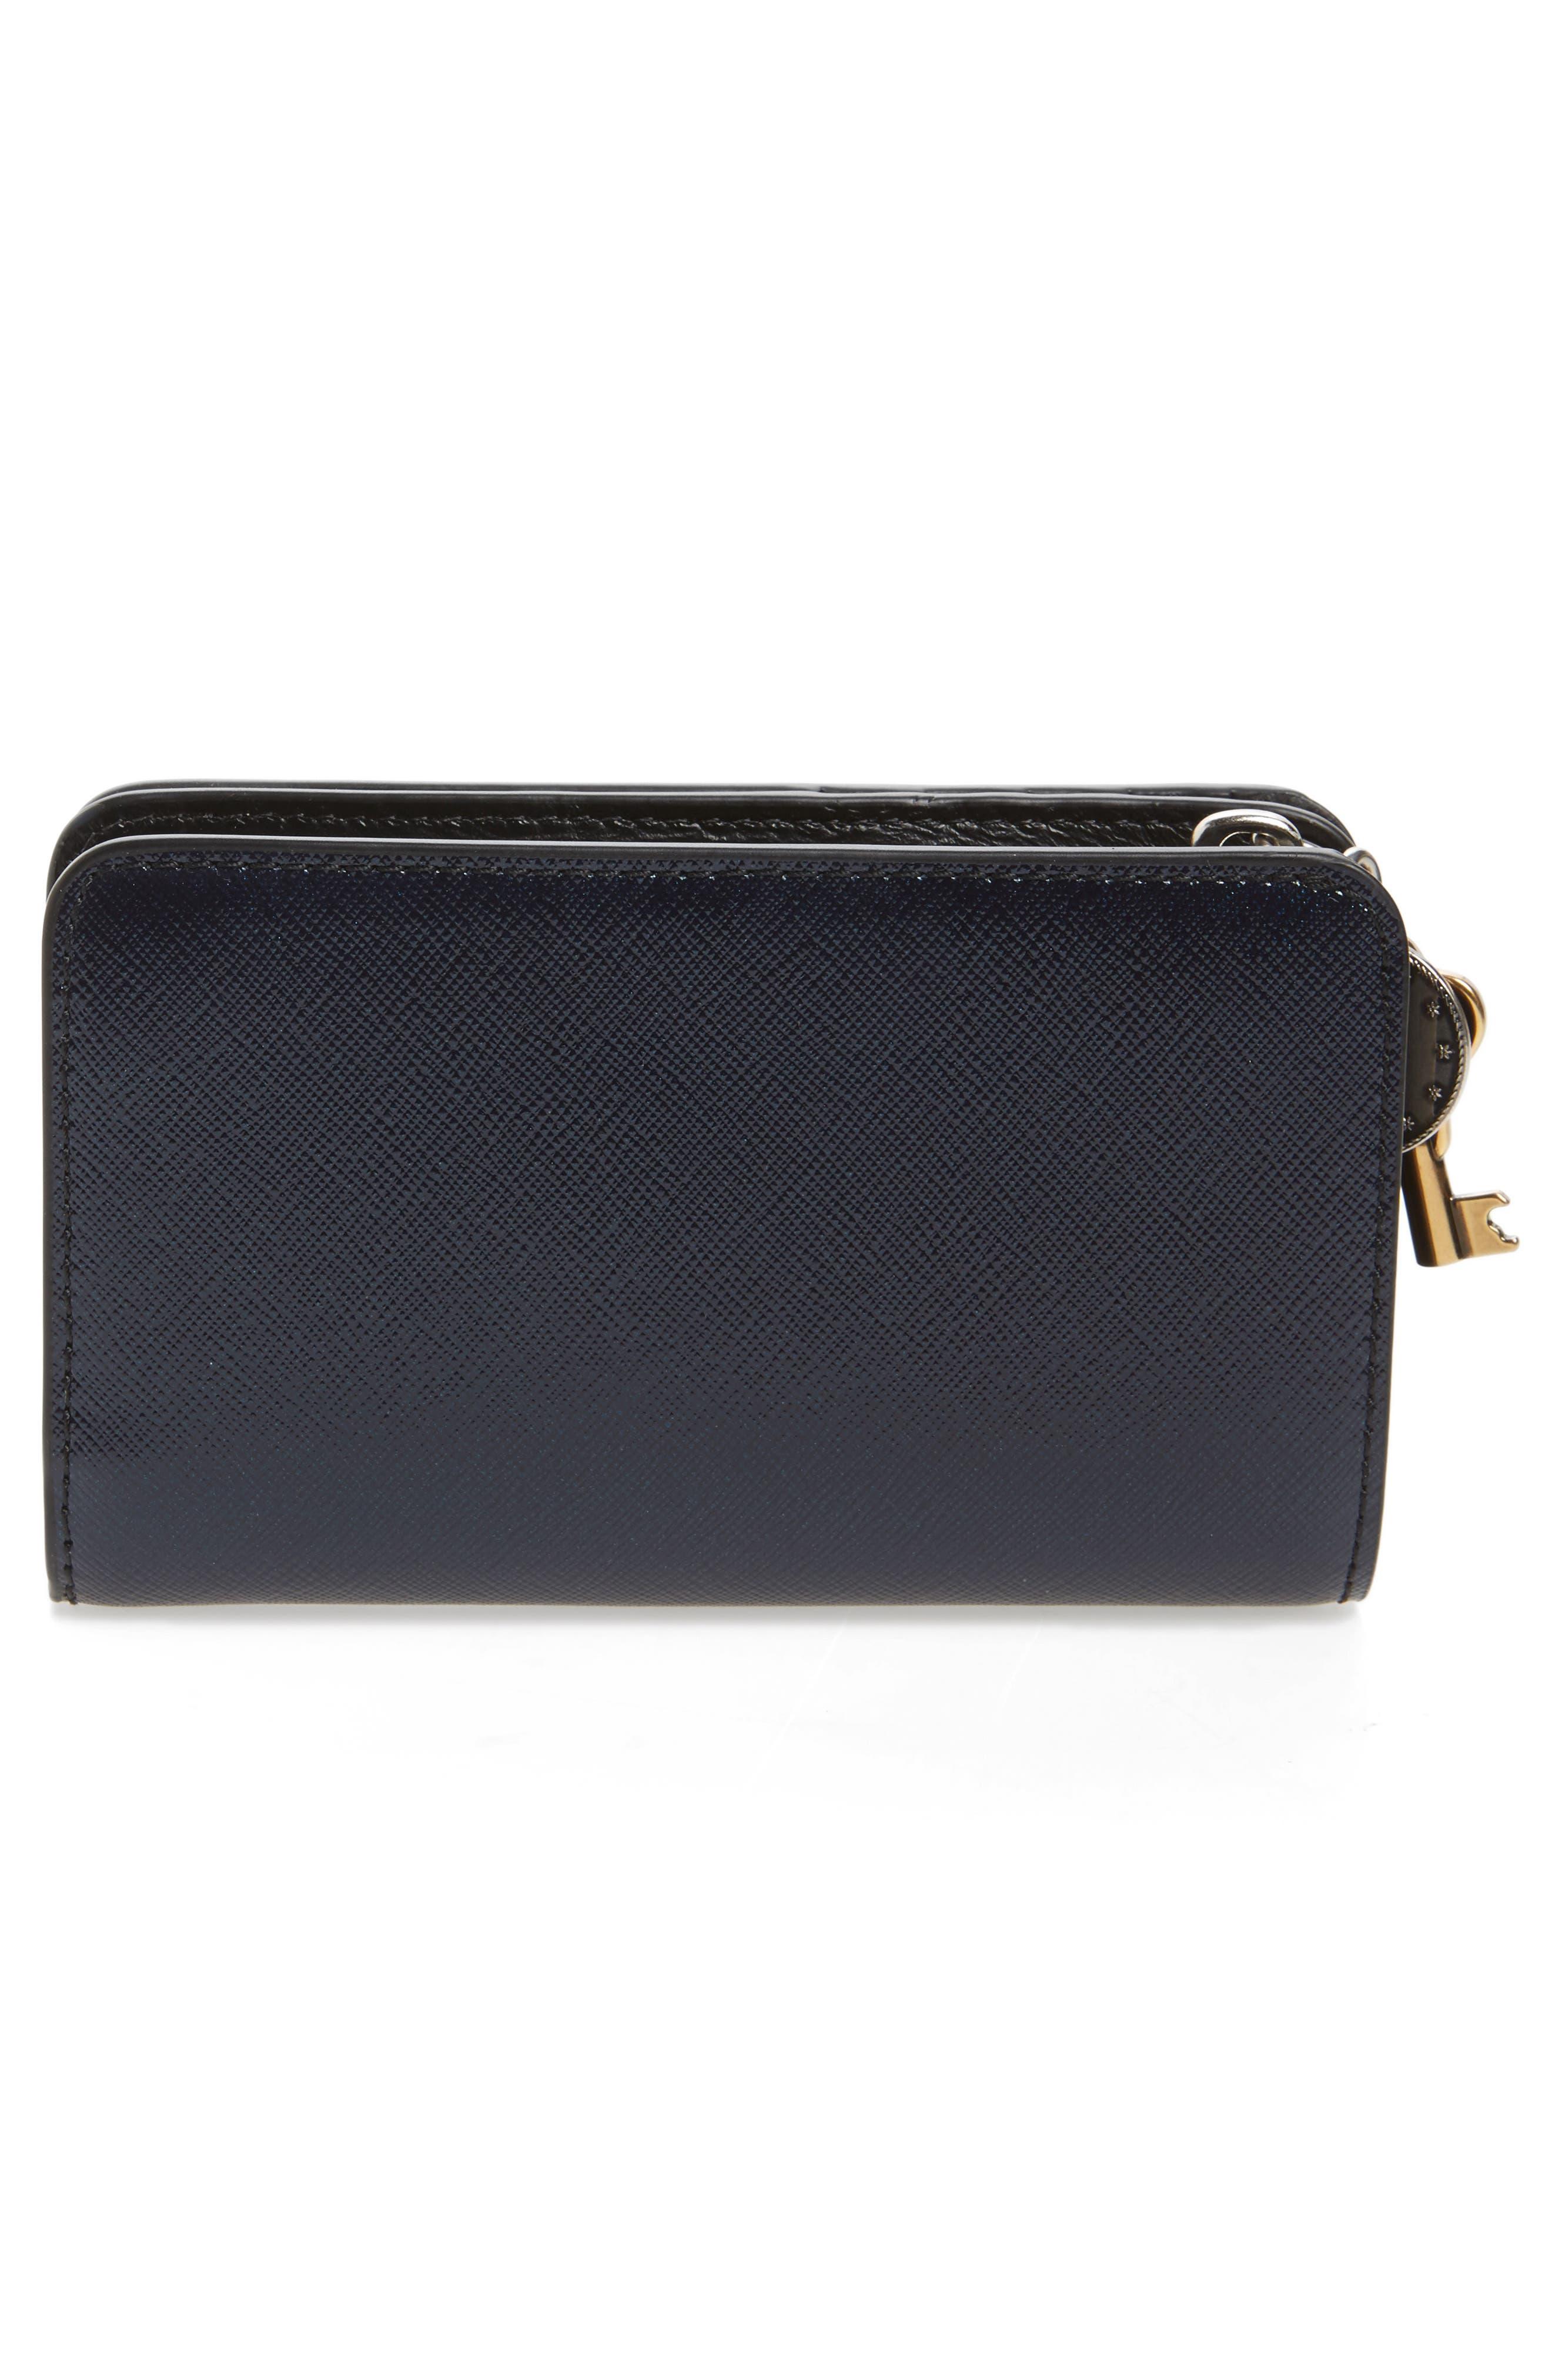 MARC JACOBS,                             Saffiano Leather Compact Wallet,                             Alternate thumbnail 3, color,                             410